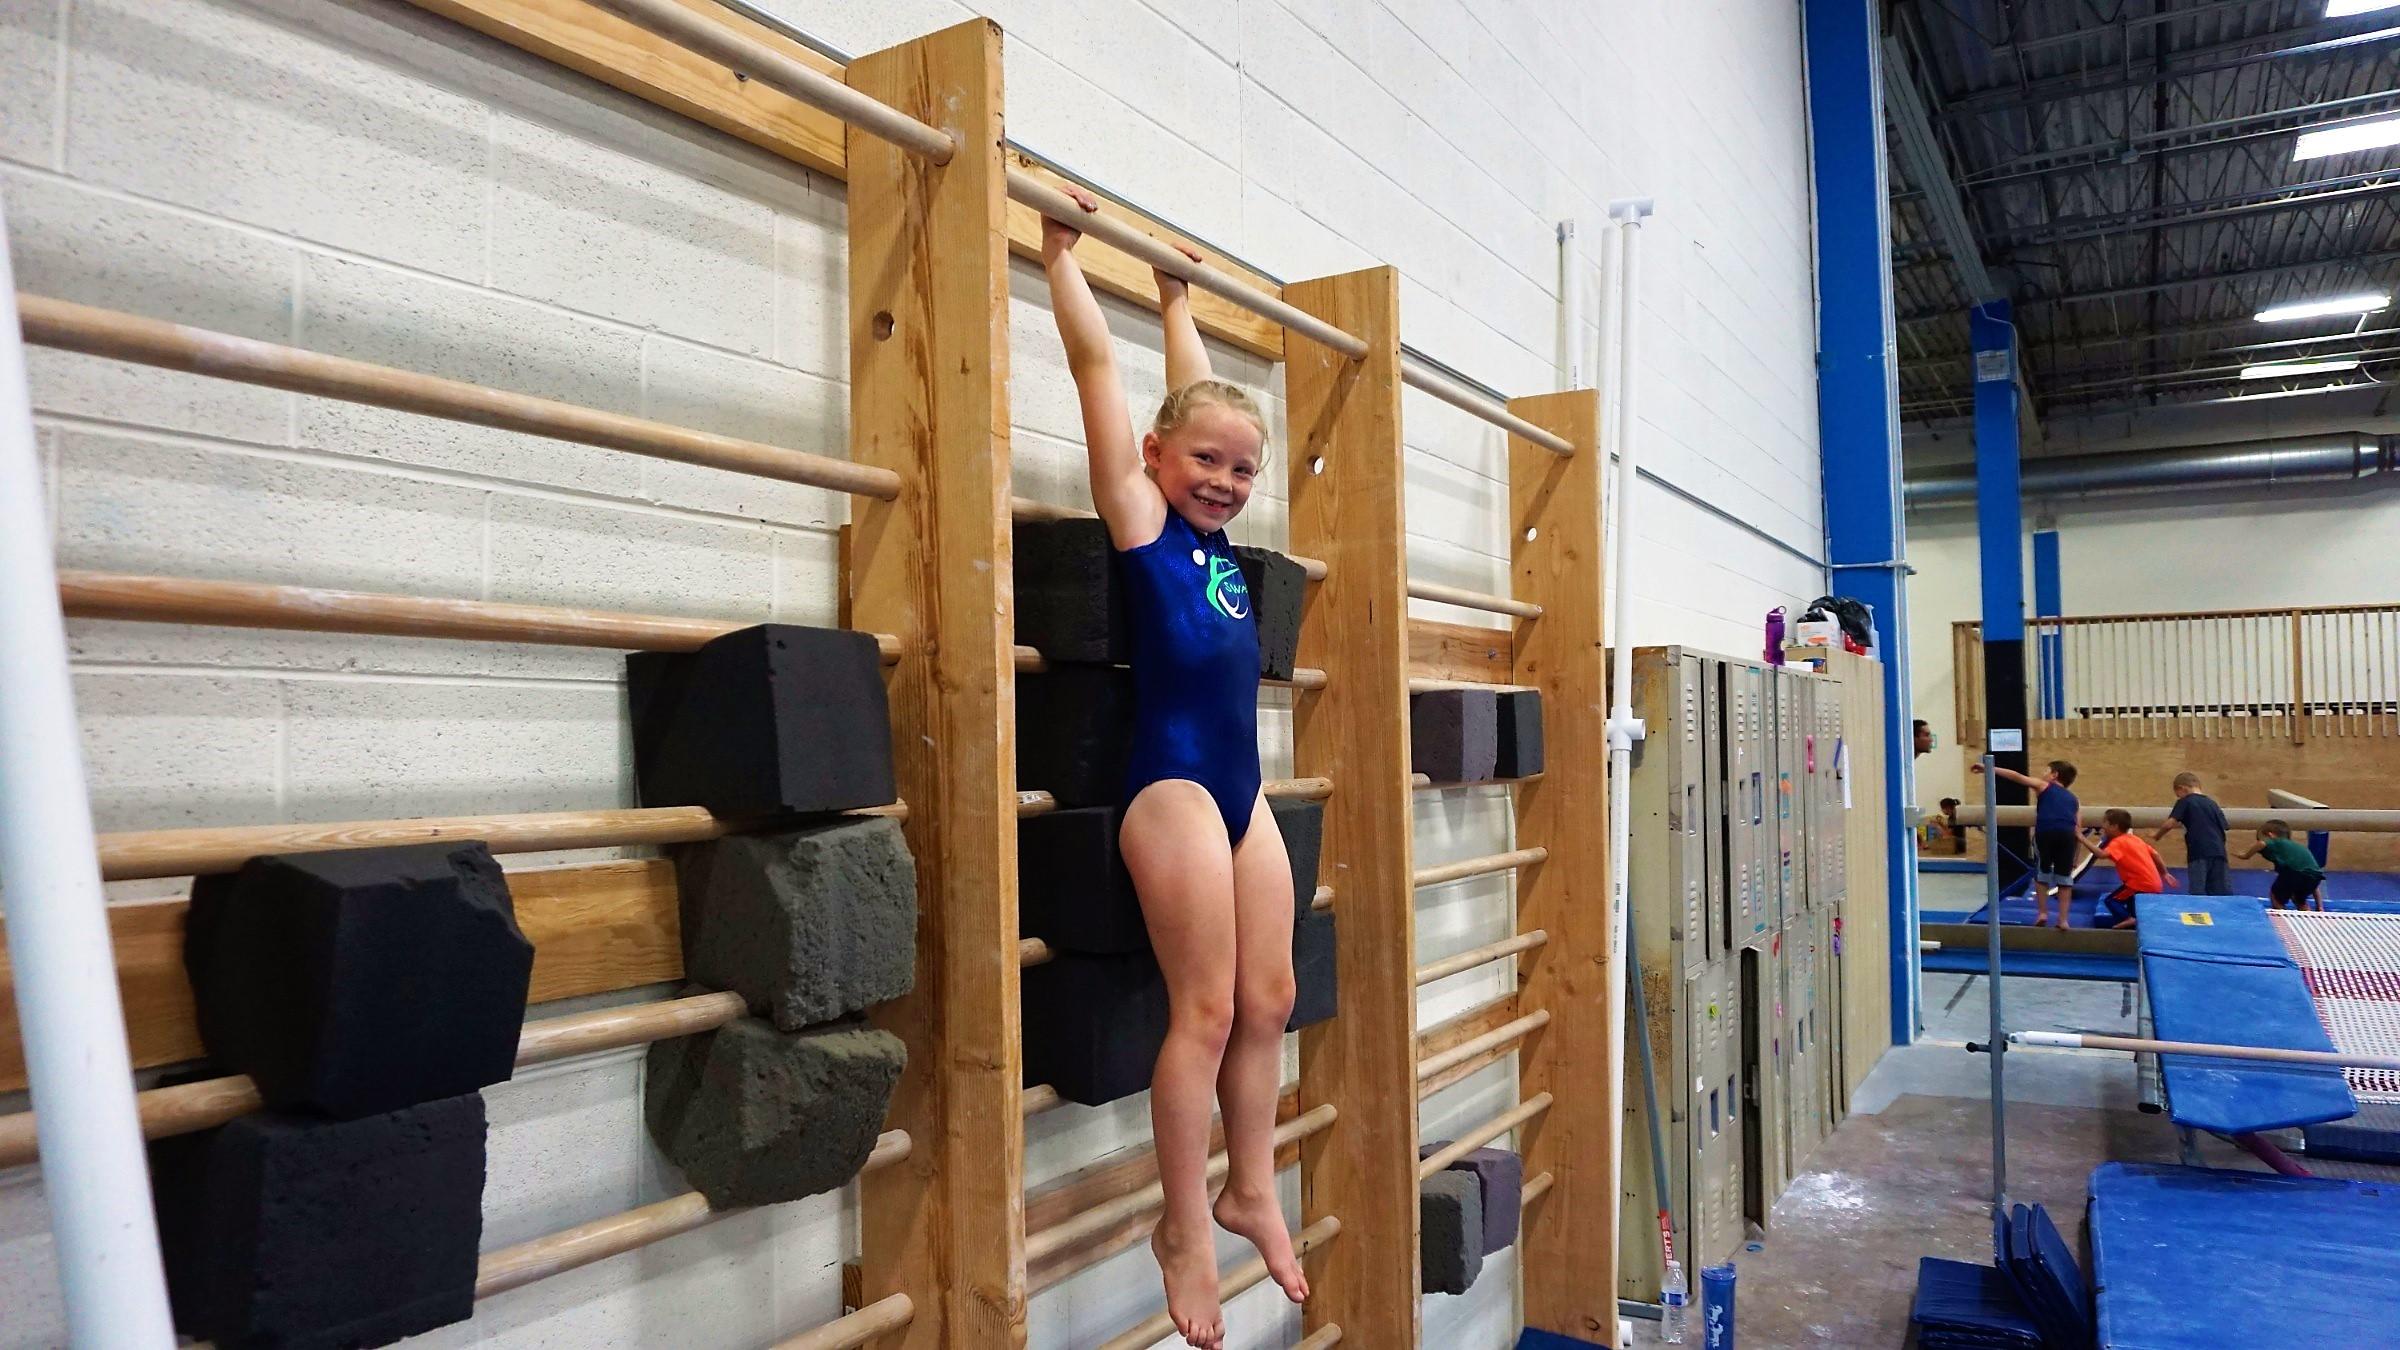 gymnast-smiling